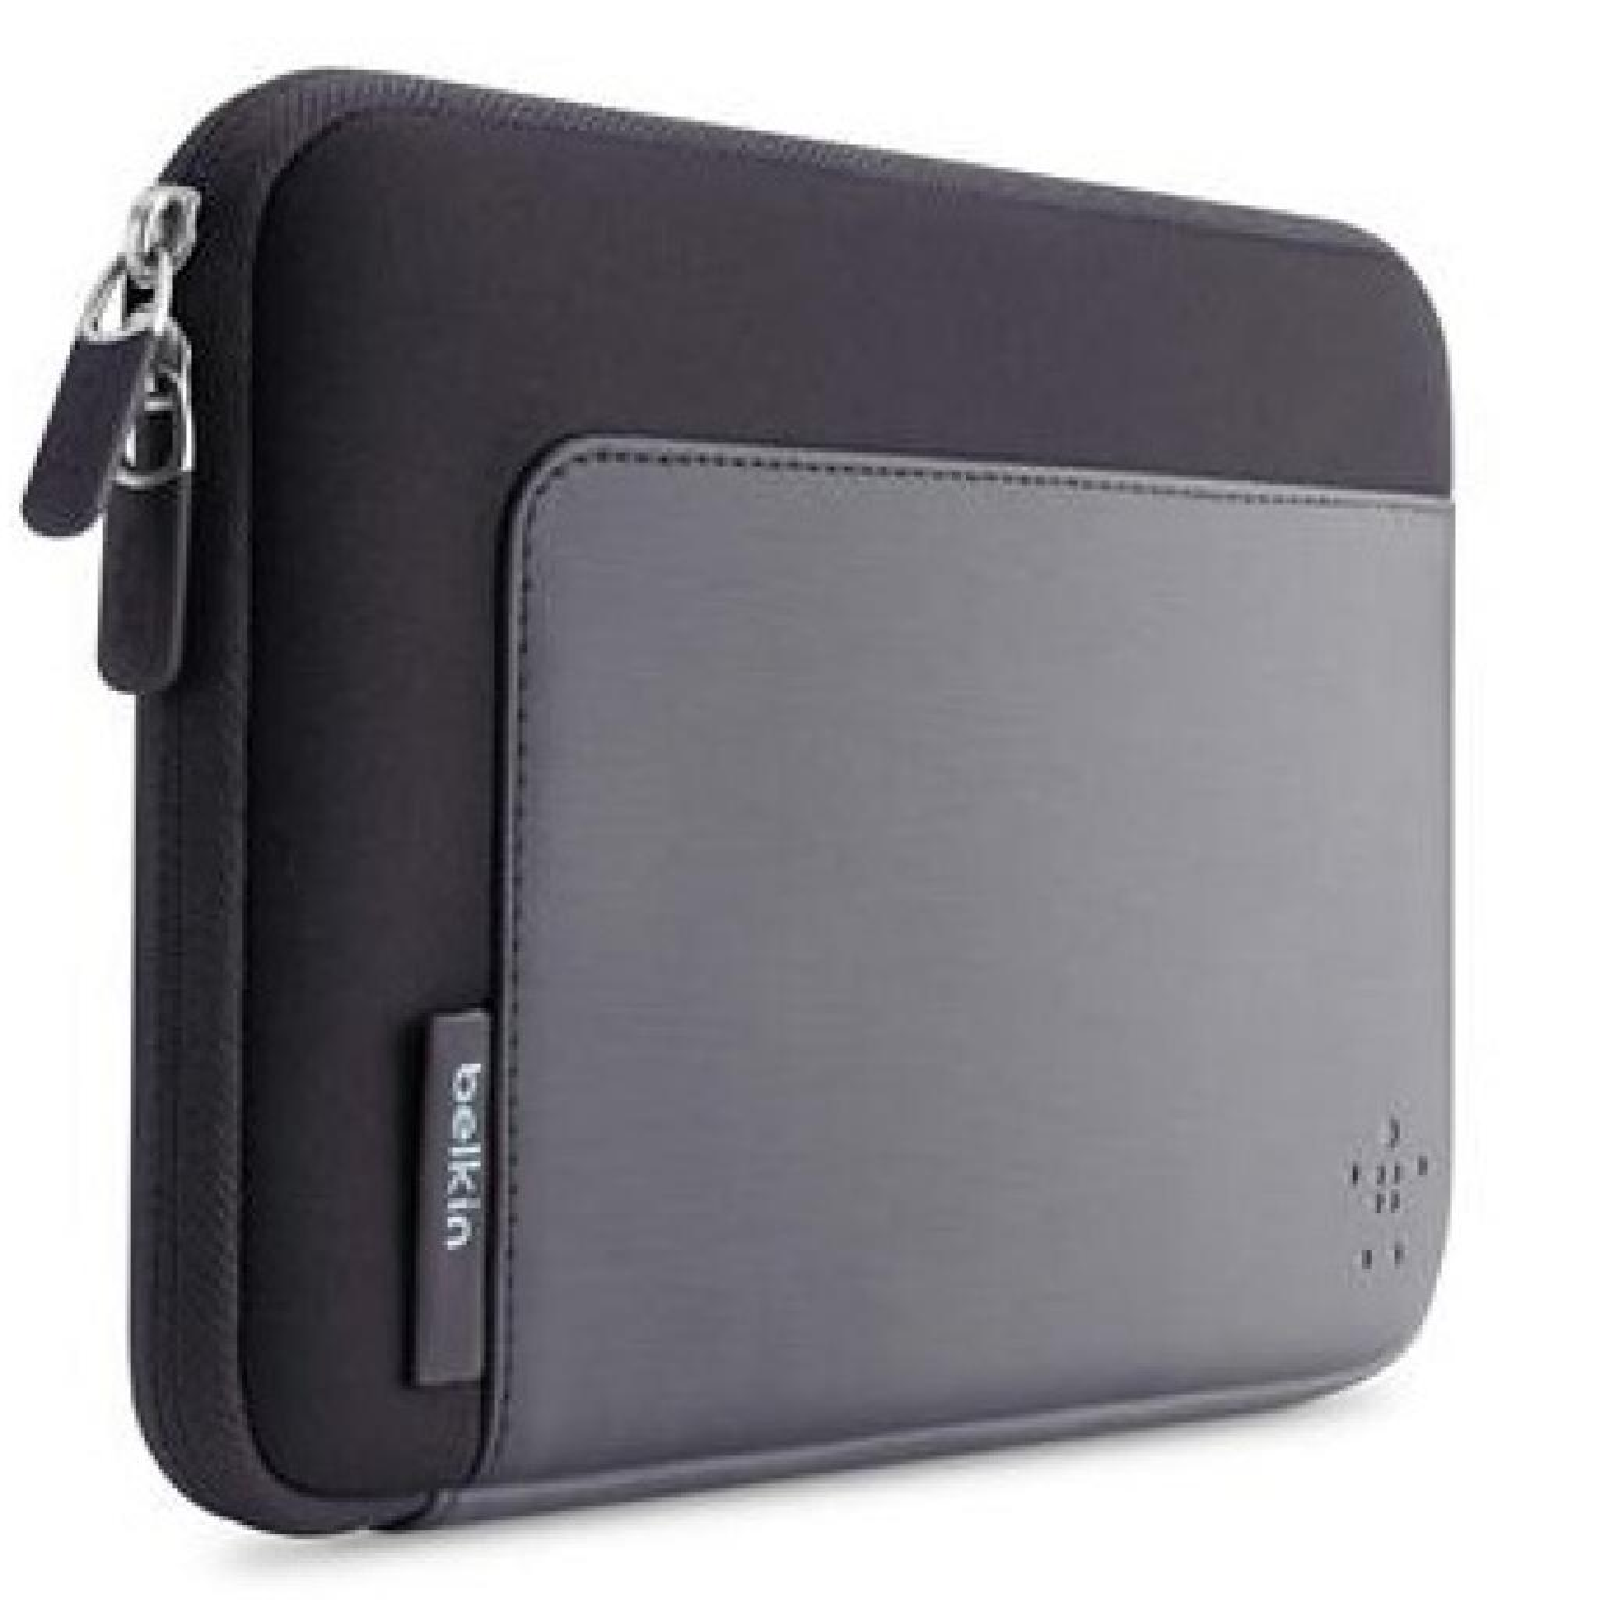 Чехол для планшета Belkin 7 Universal Cover Sleeve (F8N883vfC00)